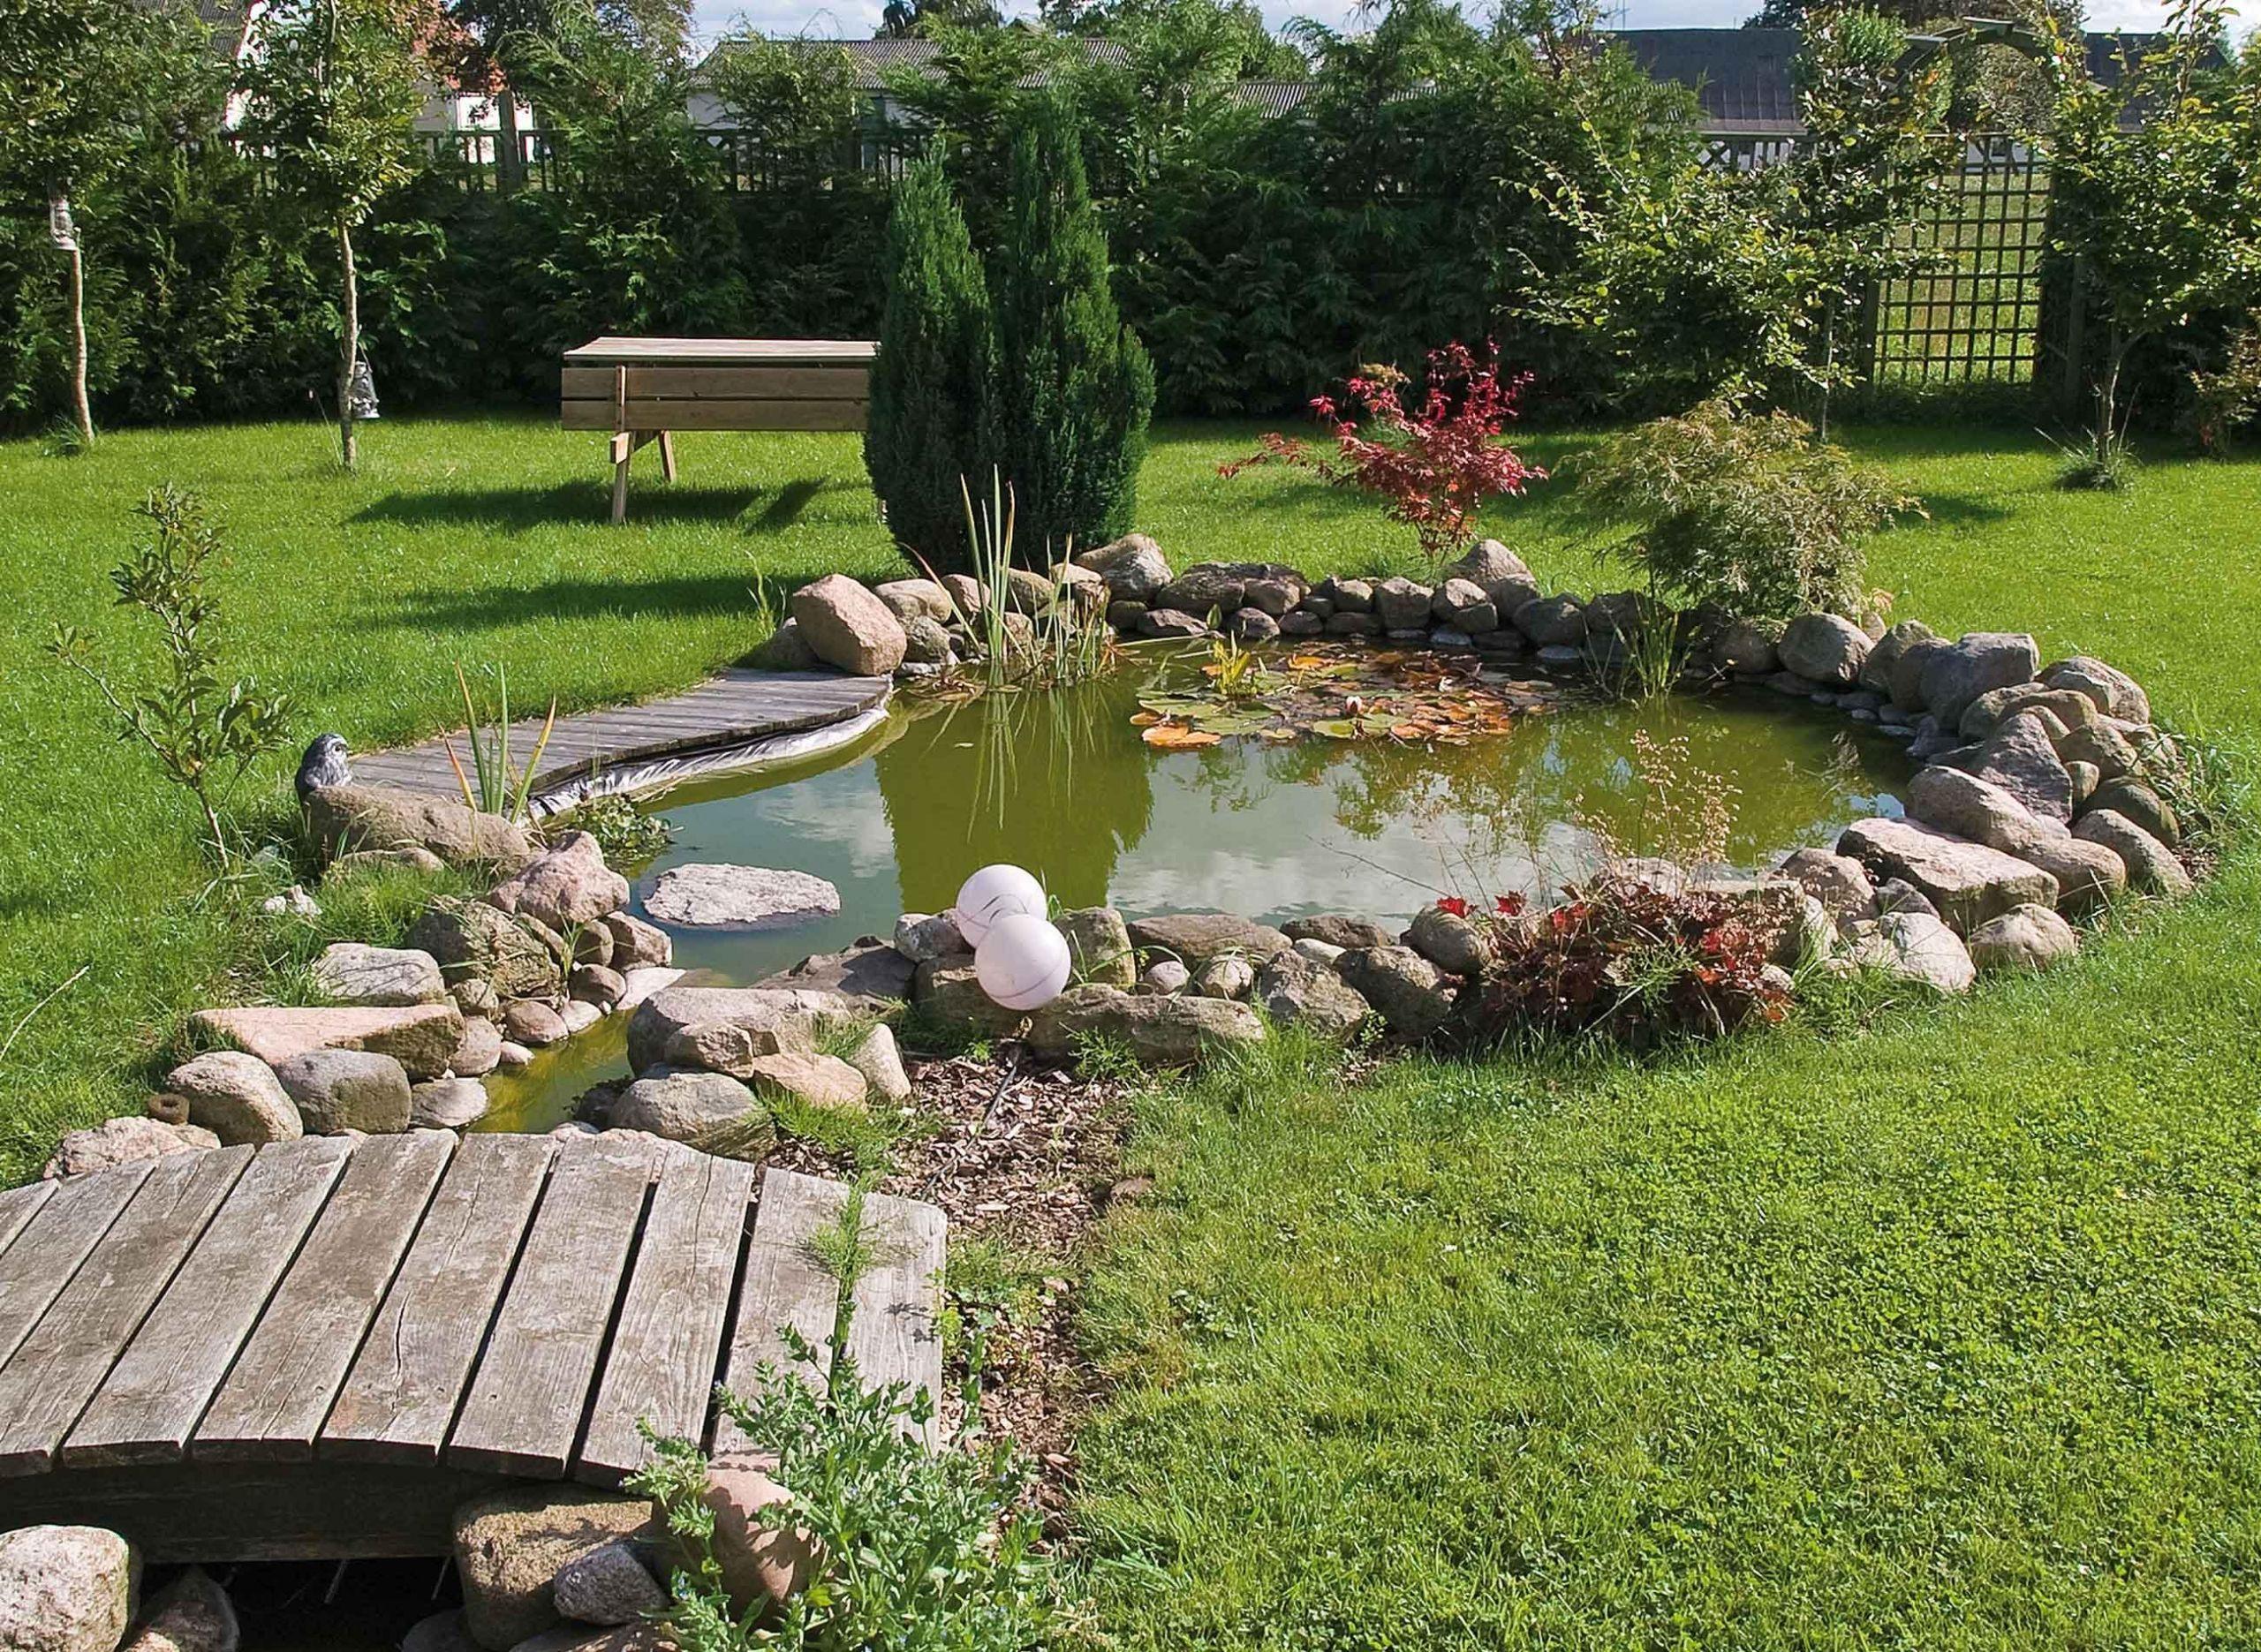 Aménagement bassin extérieur Lille Création étang jardin